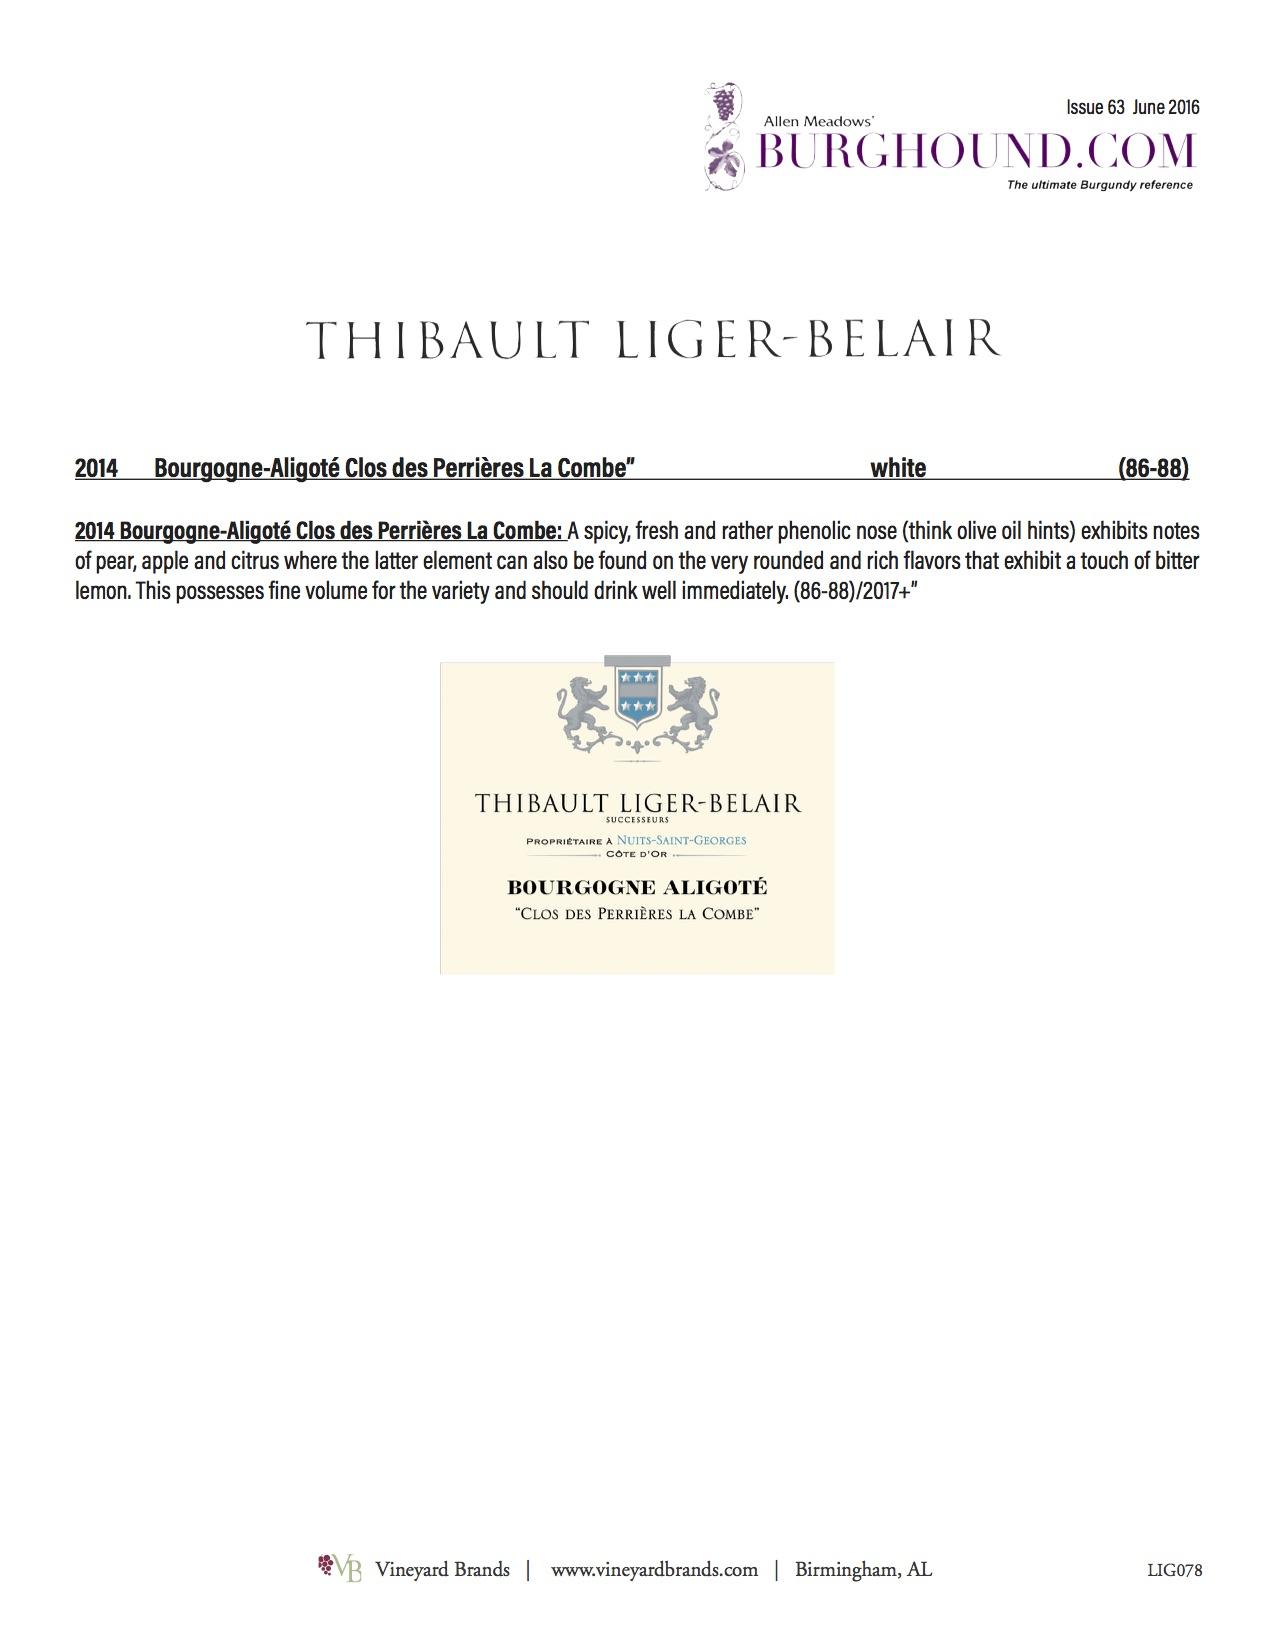 Thibault Liger-Belair Bourgogne Aligoté.jpg